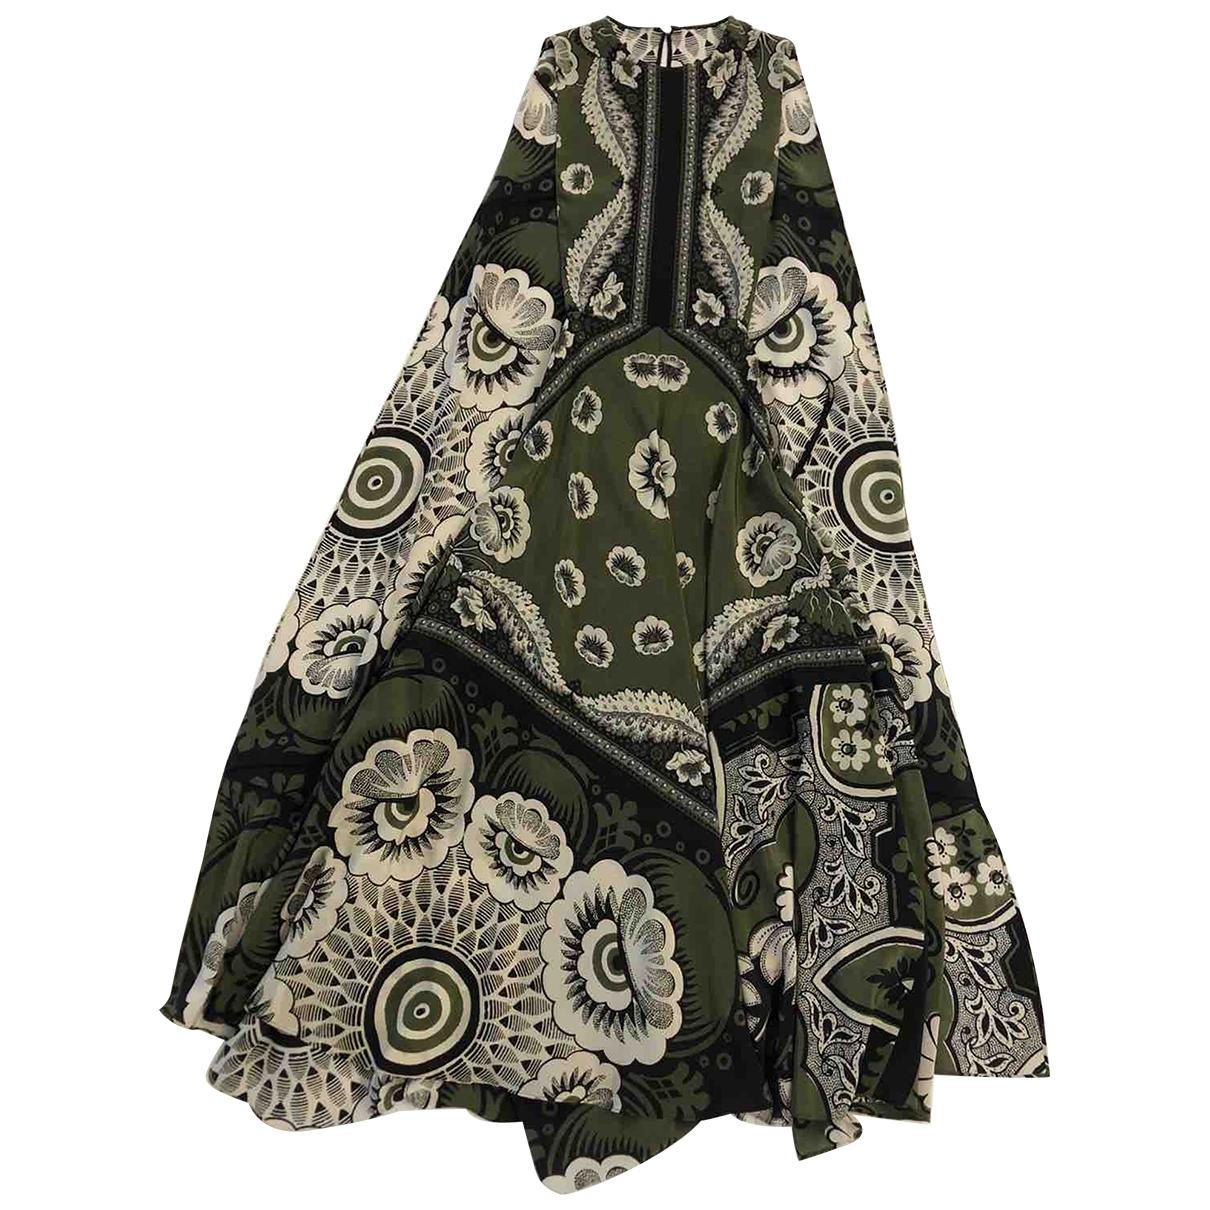 Valentino Garavani \N Green Silk dress for Women 38 IT